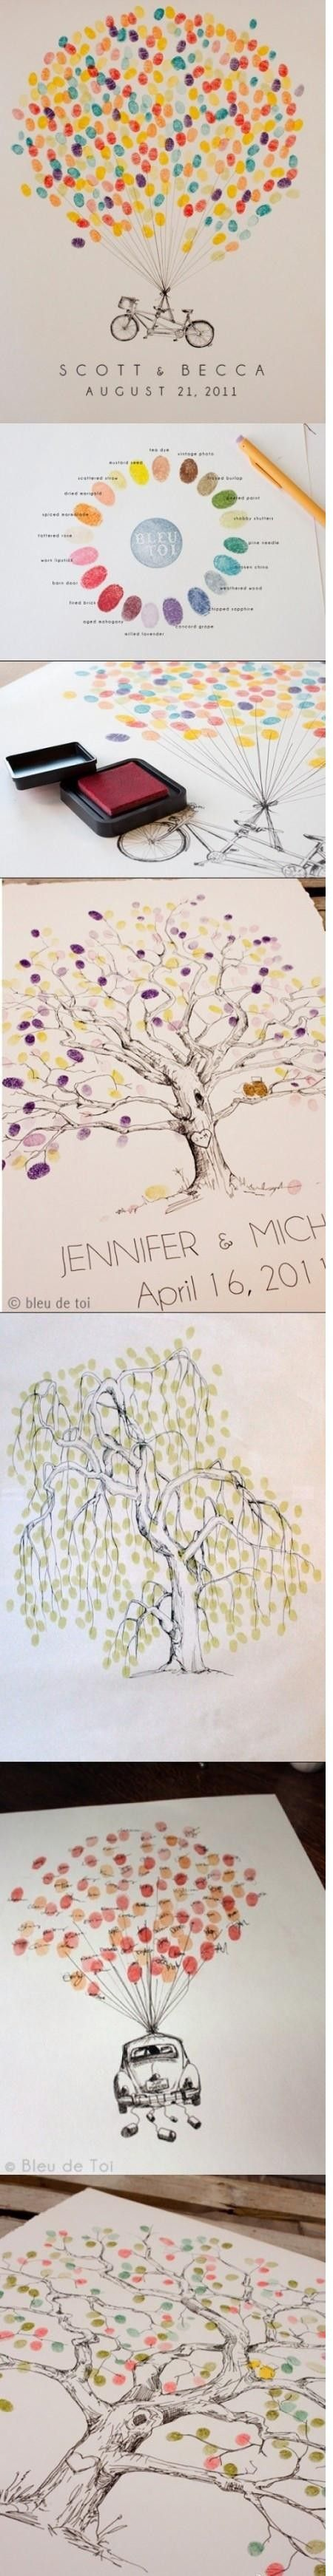 Fingerprint wedding guest books ideas So cute!!